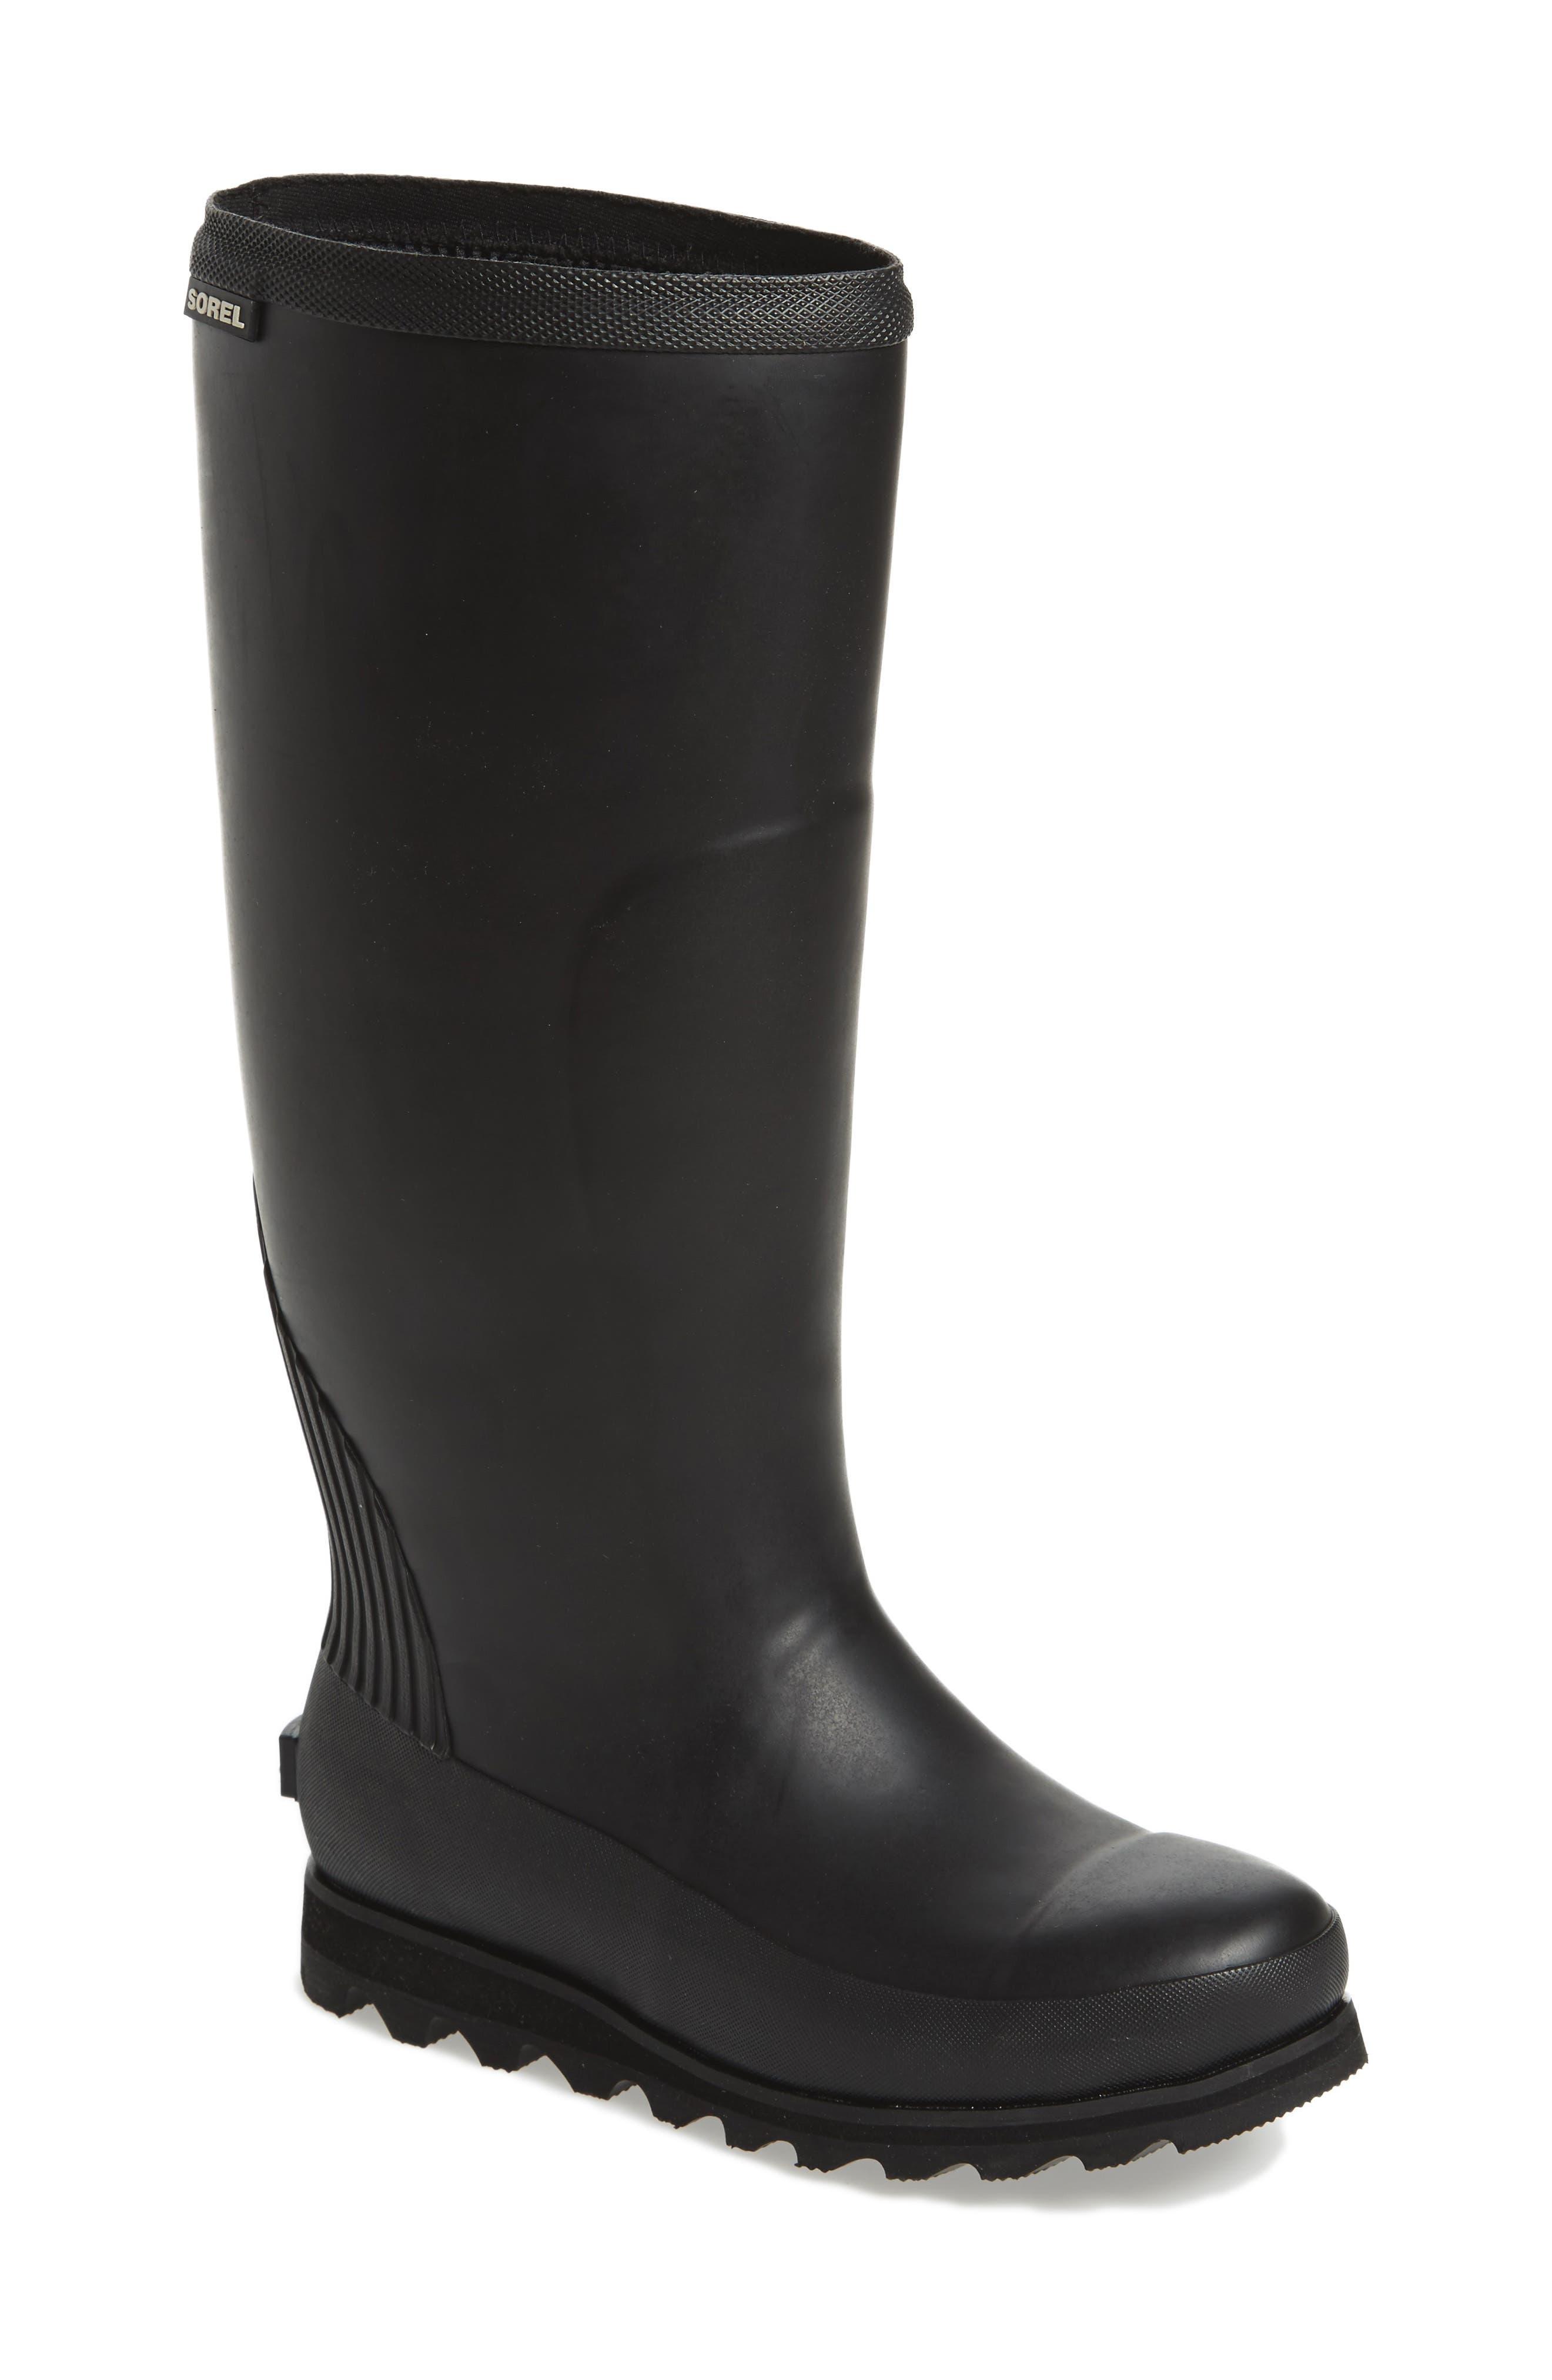 Alternate Image 1 Selected - SOREL Joan Tall Rain Boot (Women)